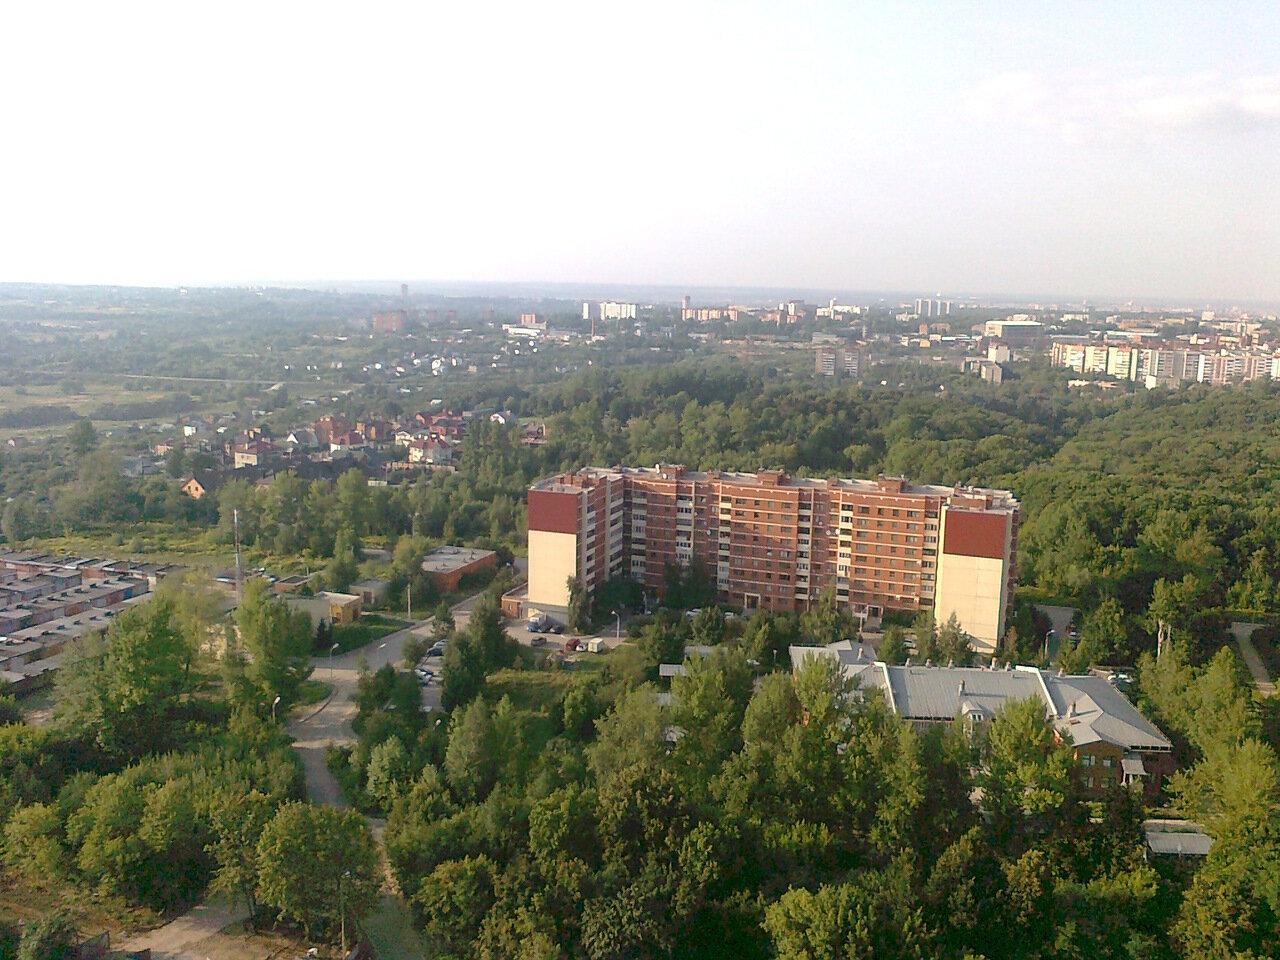 http://img-fotki.yandex.ru/get/6716/162482795.4/0_bc73c_f2619b75_XXXL.jpg